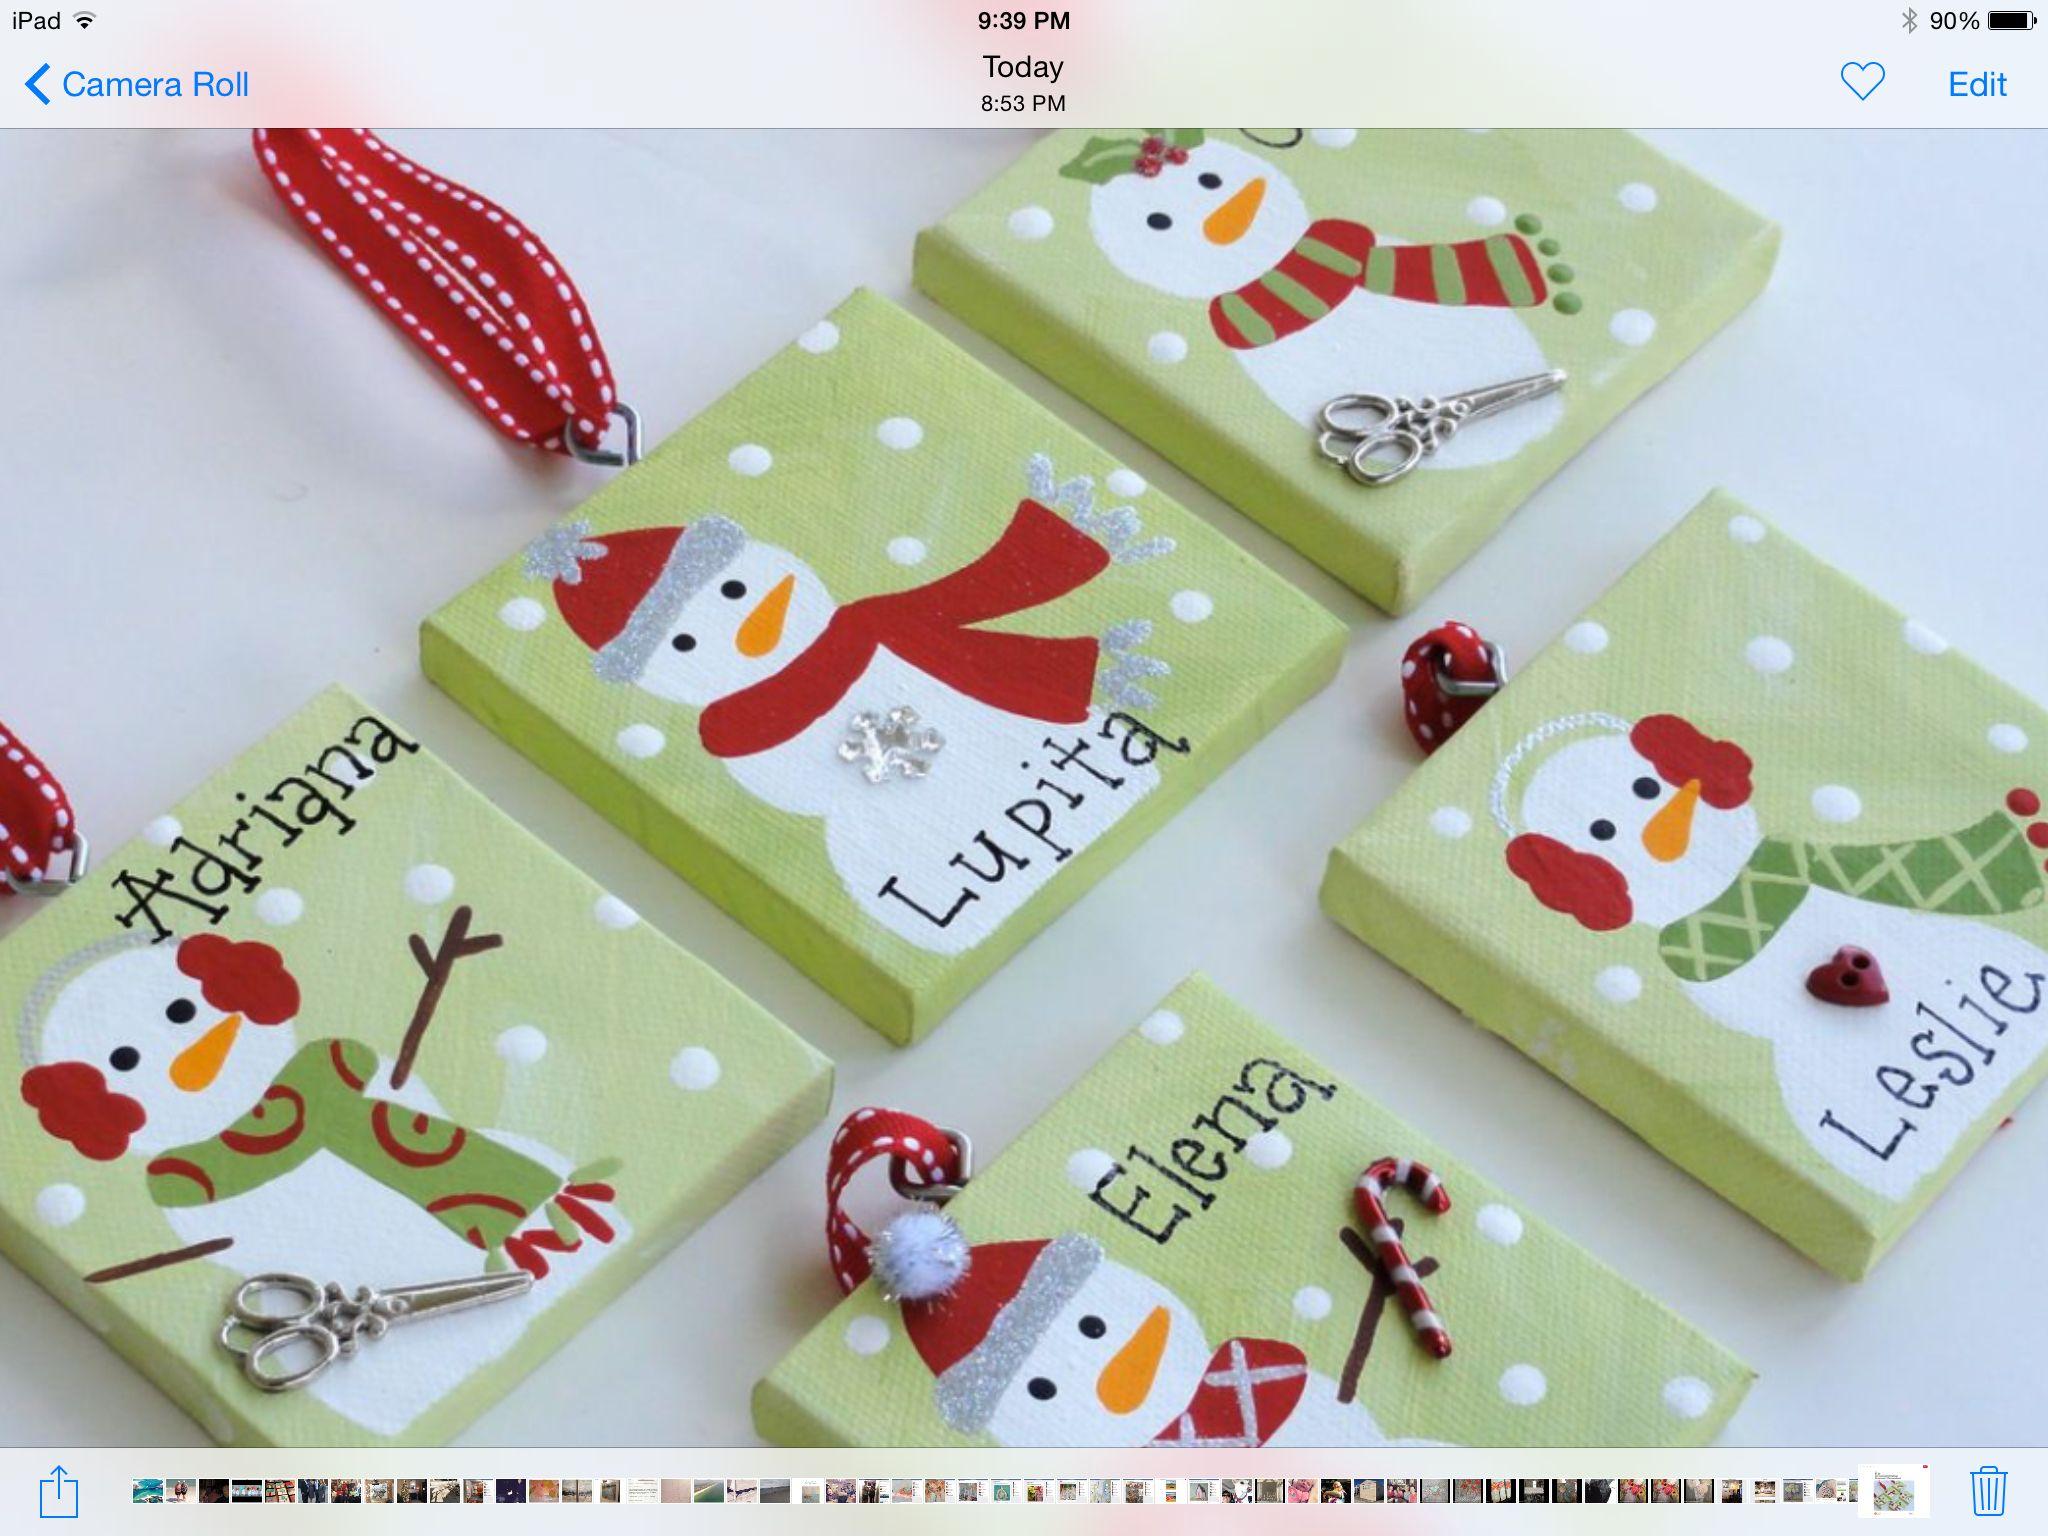 Handpainted Mini Canvas Christmas Ornaments By Ohmgrown On Etsy  Canvas   Pinterest  Mini Canvas, Christmas Ornament And Ornament